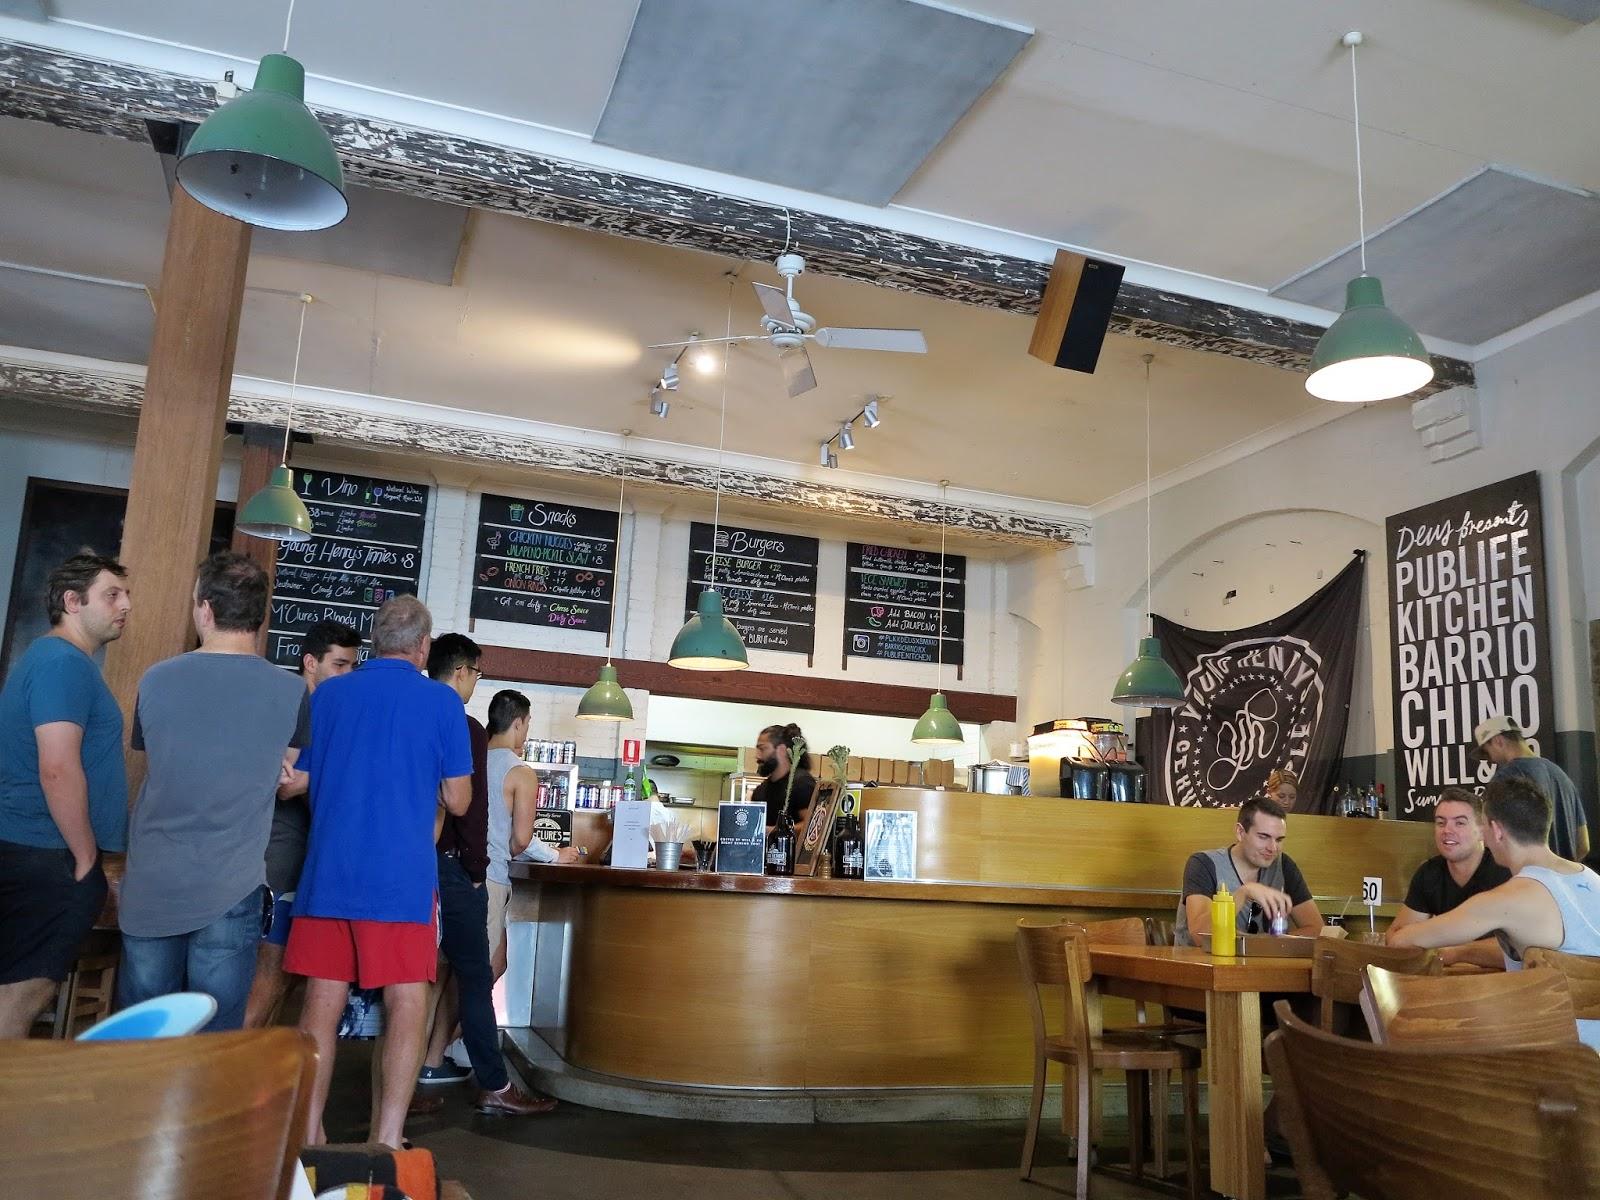 Pub Life Kitchen x Barrio Cellar Burger Pop Up Deus Cafe